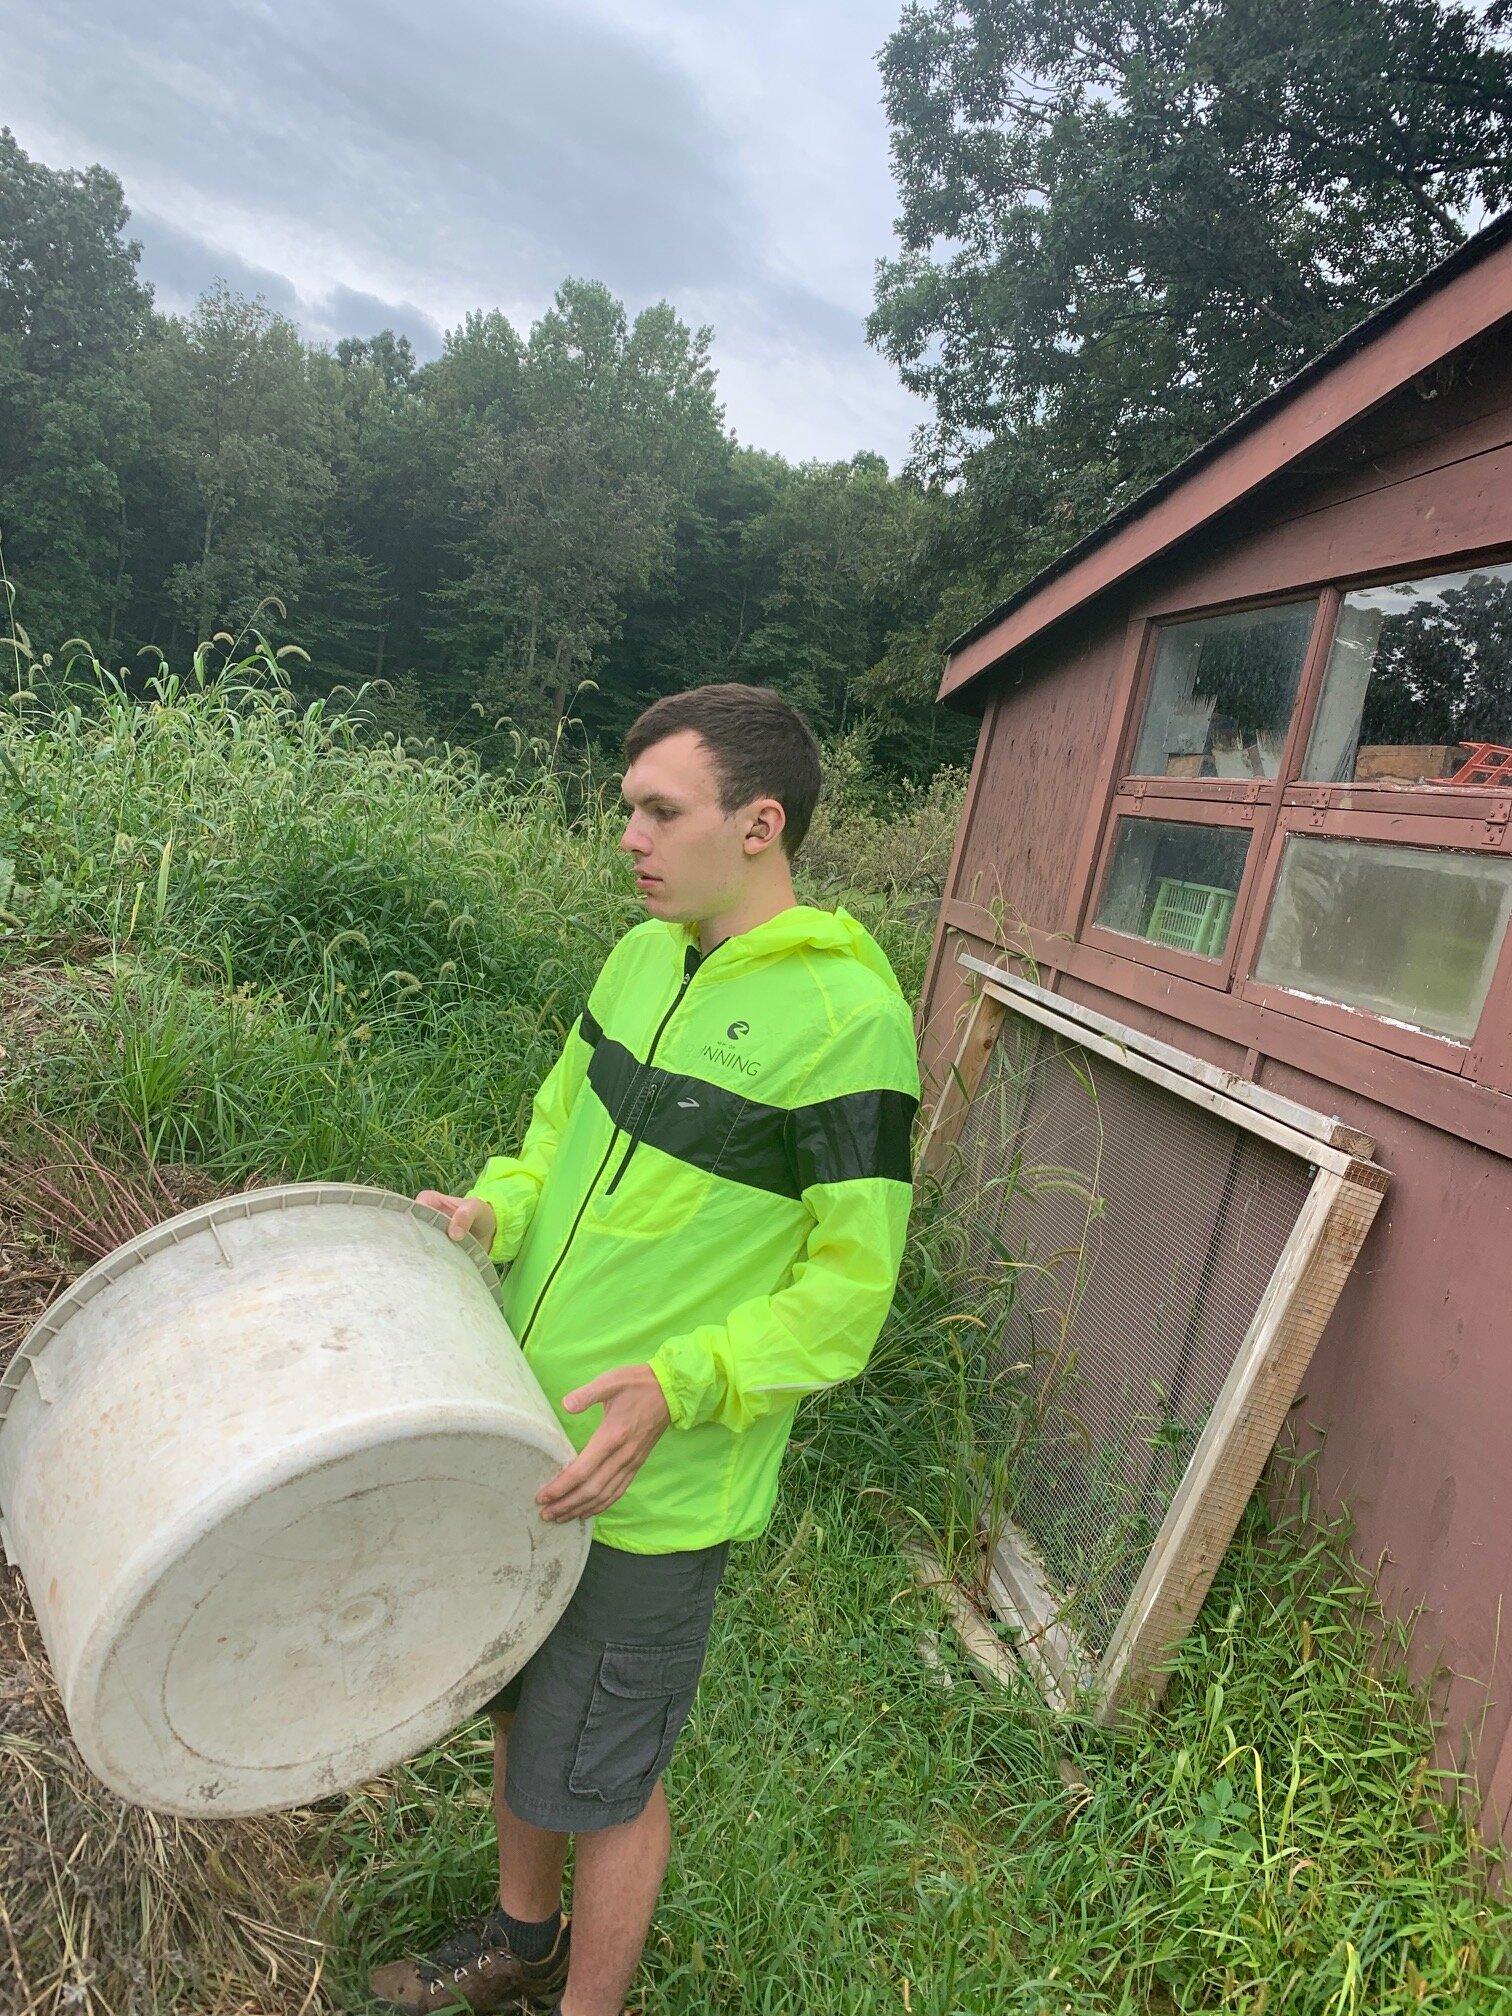 Dustin the Biodynamic Farmer at Endeavor 21+ in Rockland County, NY